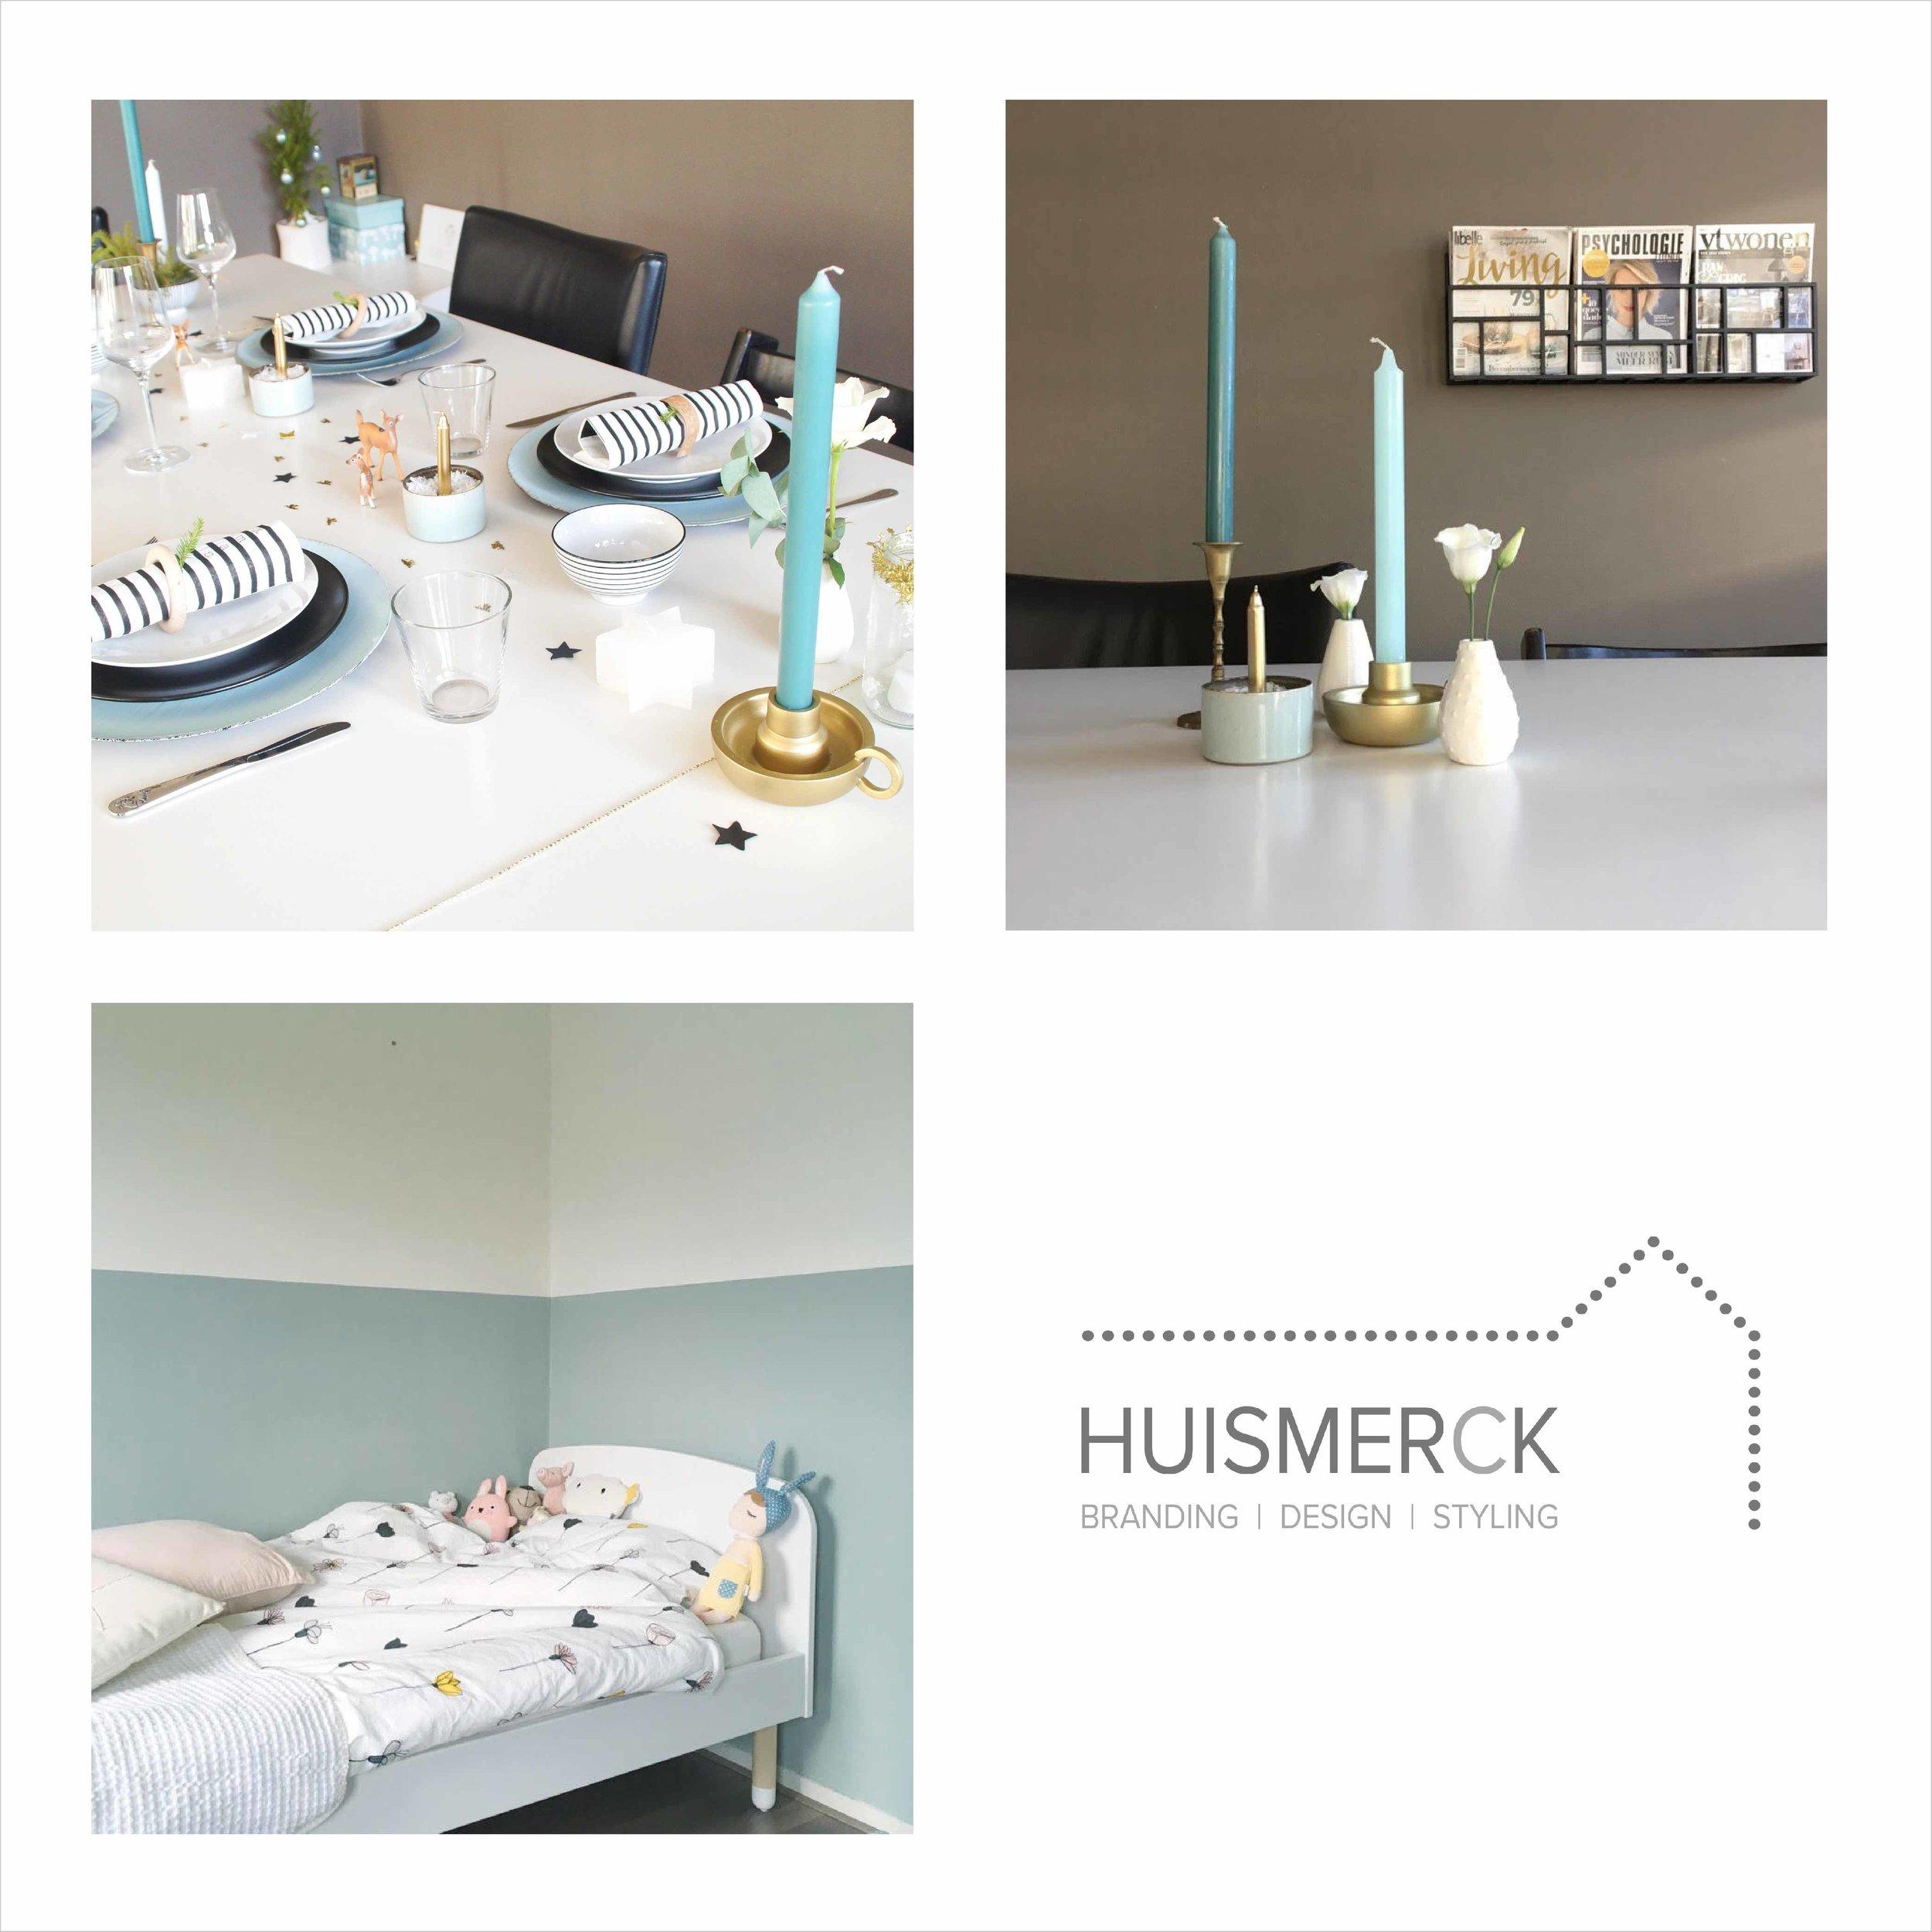 HUISMERCK-PROJECTEN_TN_VISUAL_BRANDING_HUISMERCK-01.jpg